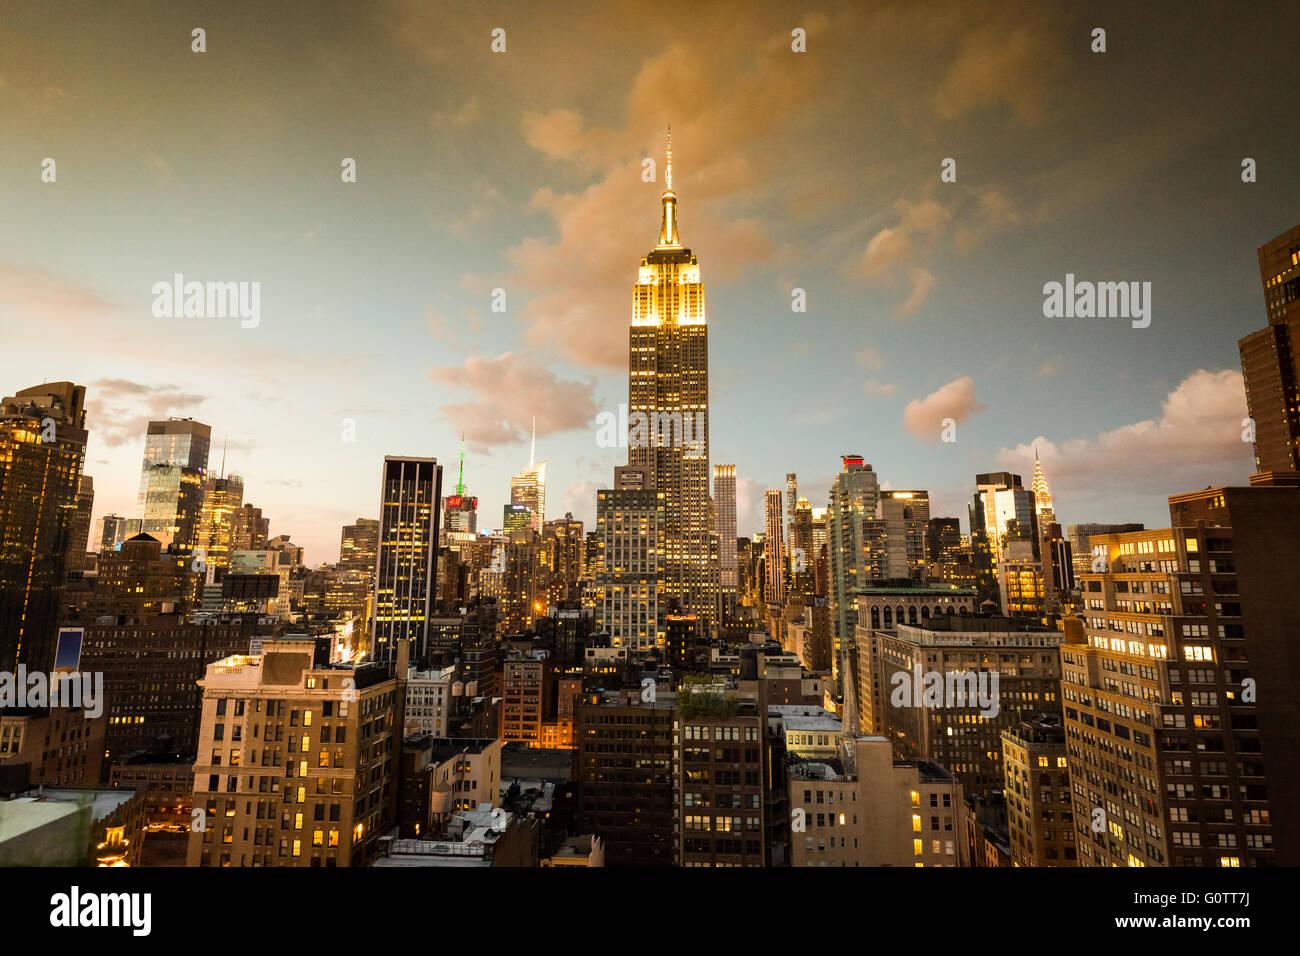 NEW YORK - 23.August: Blick auf Midtown Manhattan mit dem berühmten Empire State Building bei Sonnenuntergang. Stockbild